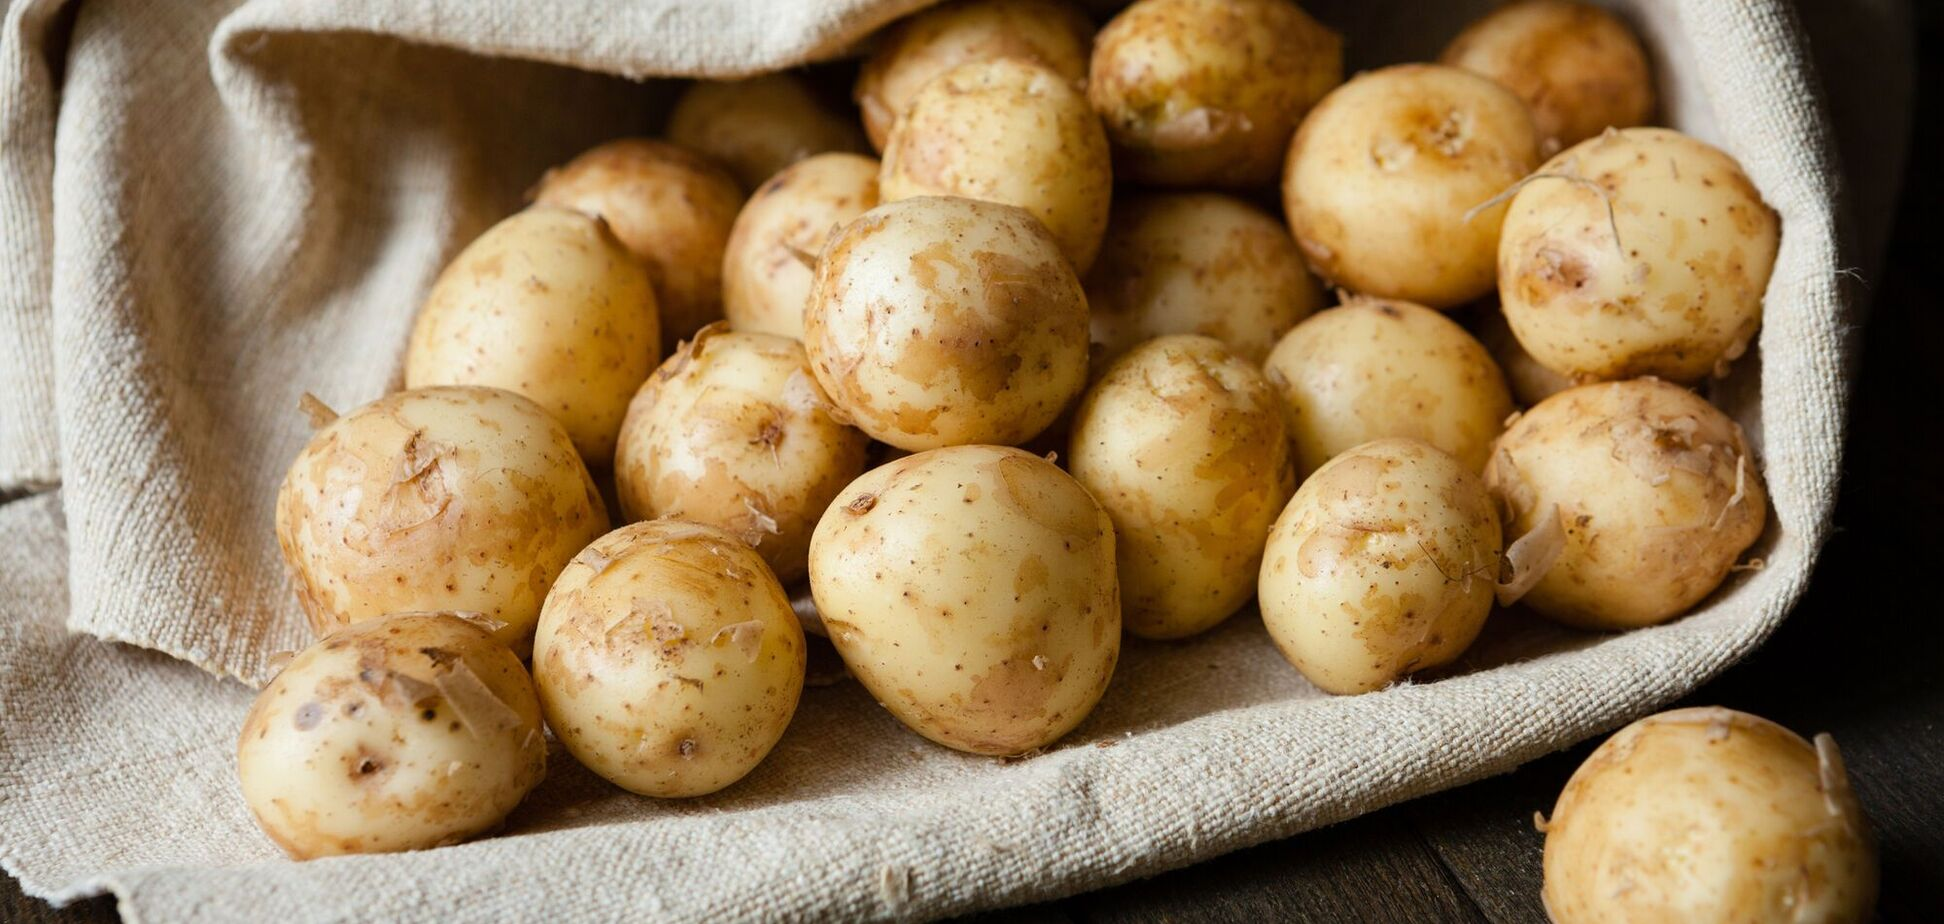 В Украине подешевела картошка